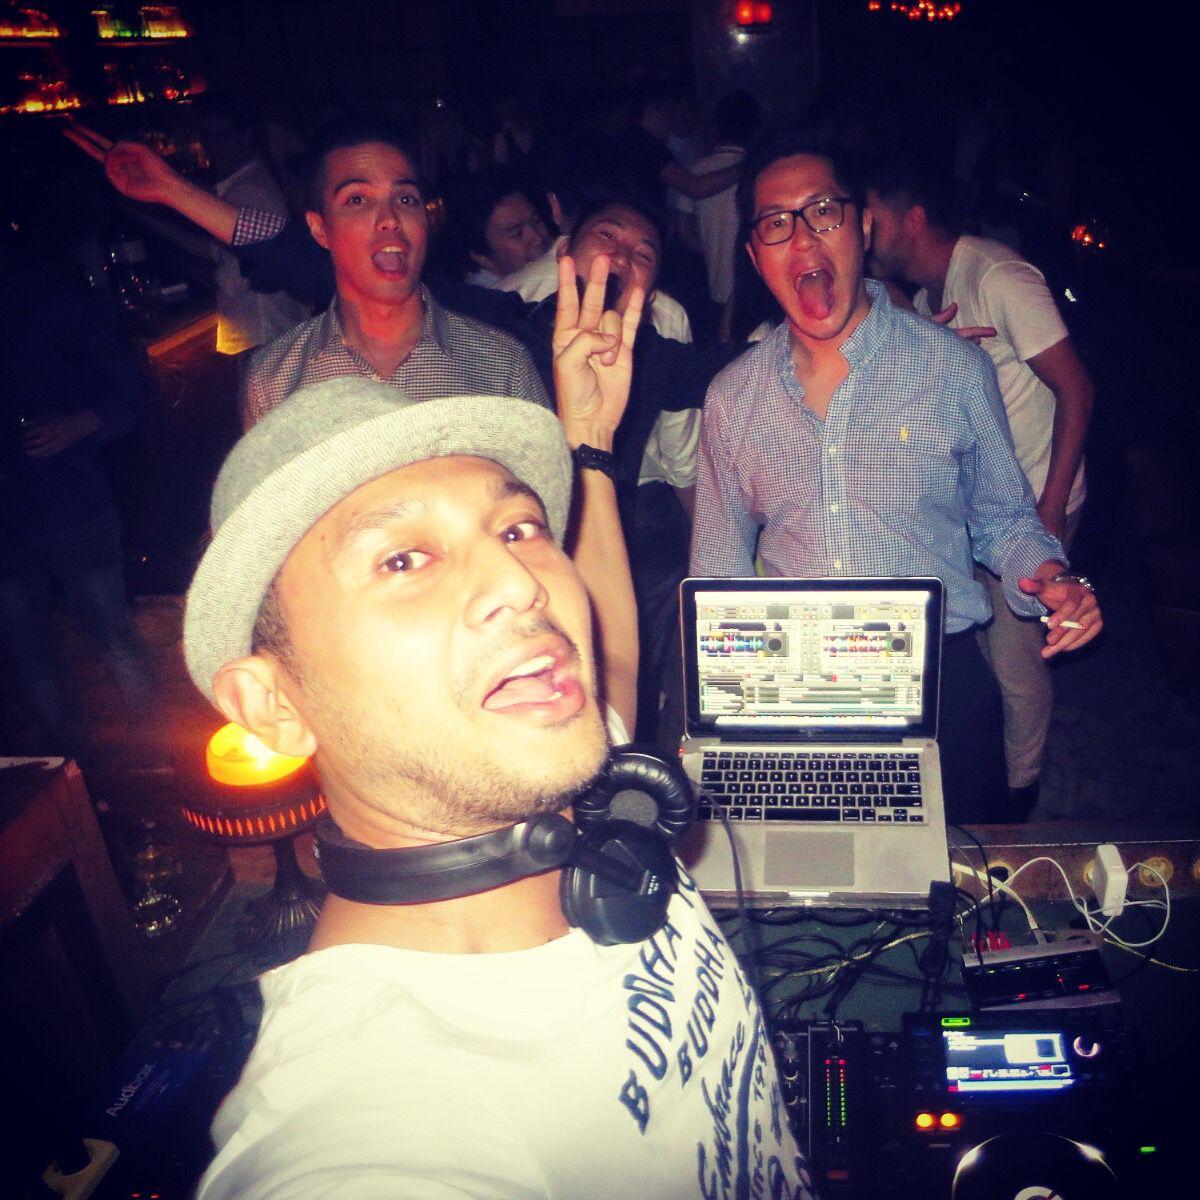 Last night spinning @bauhausjakarta... Good times as always, thanks for coming to rock out wit me and @davidjaay #triggerjkt #djmikeymoran